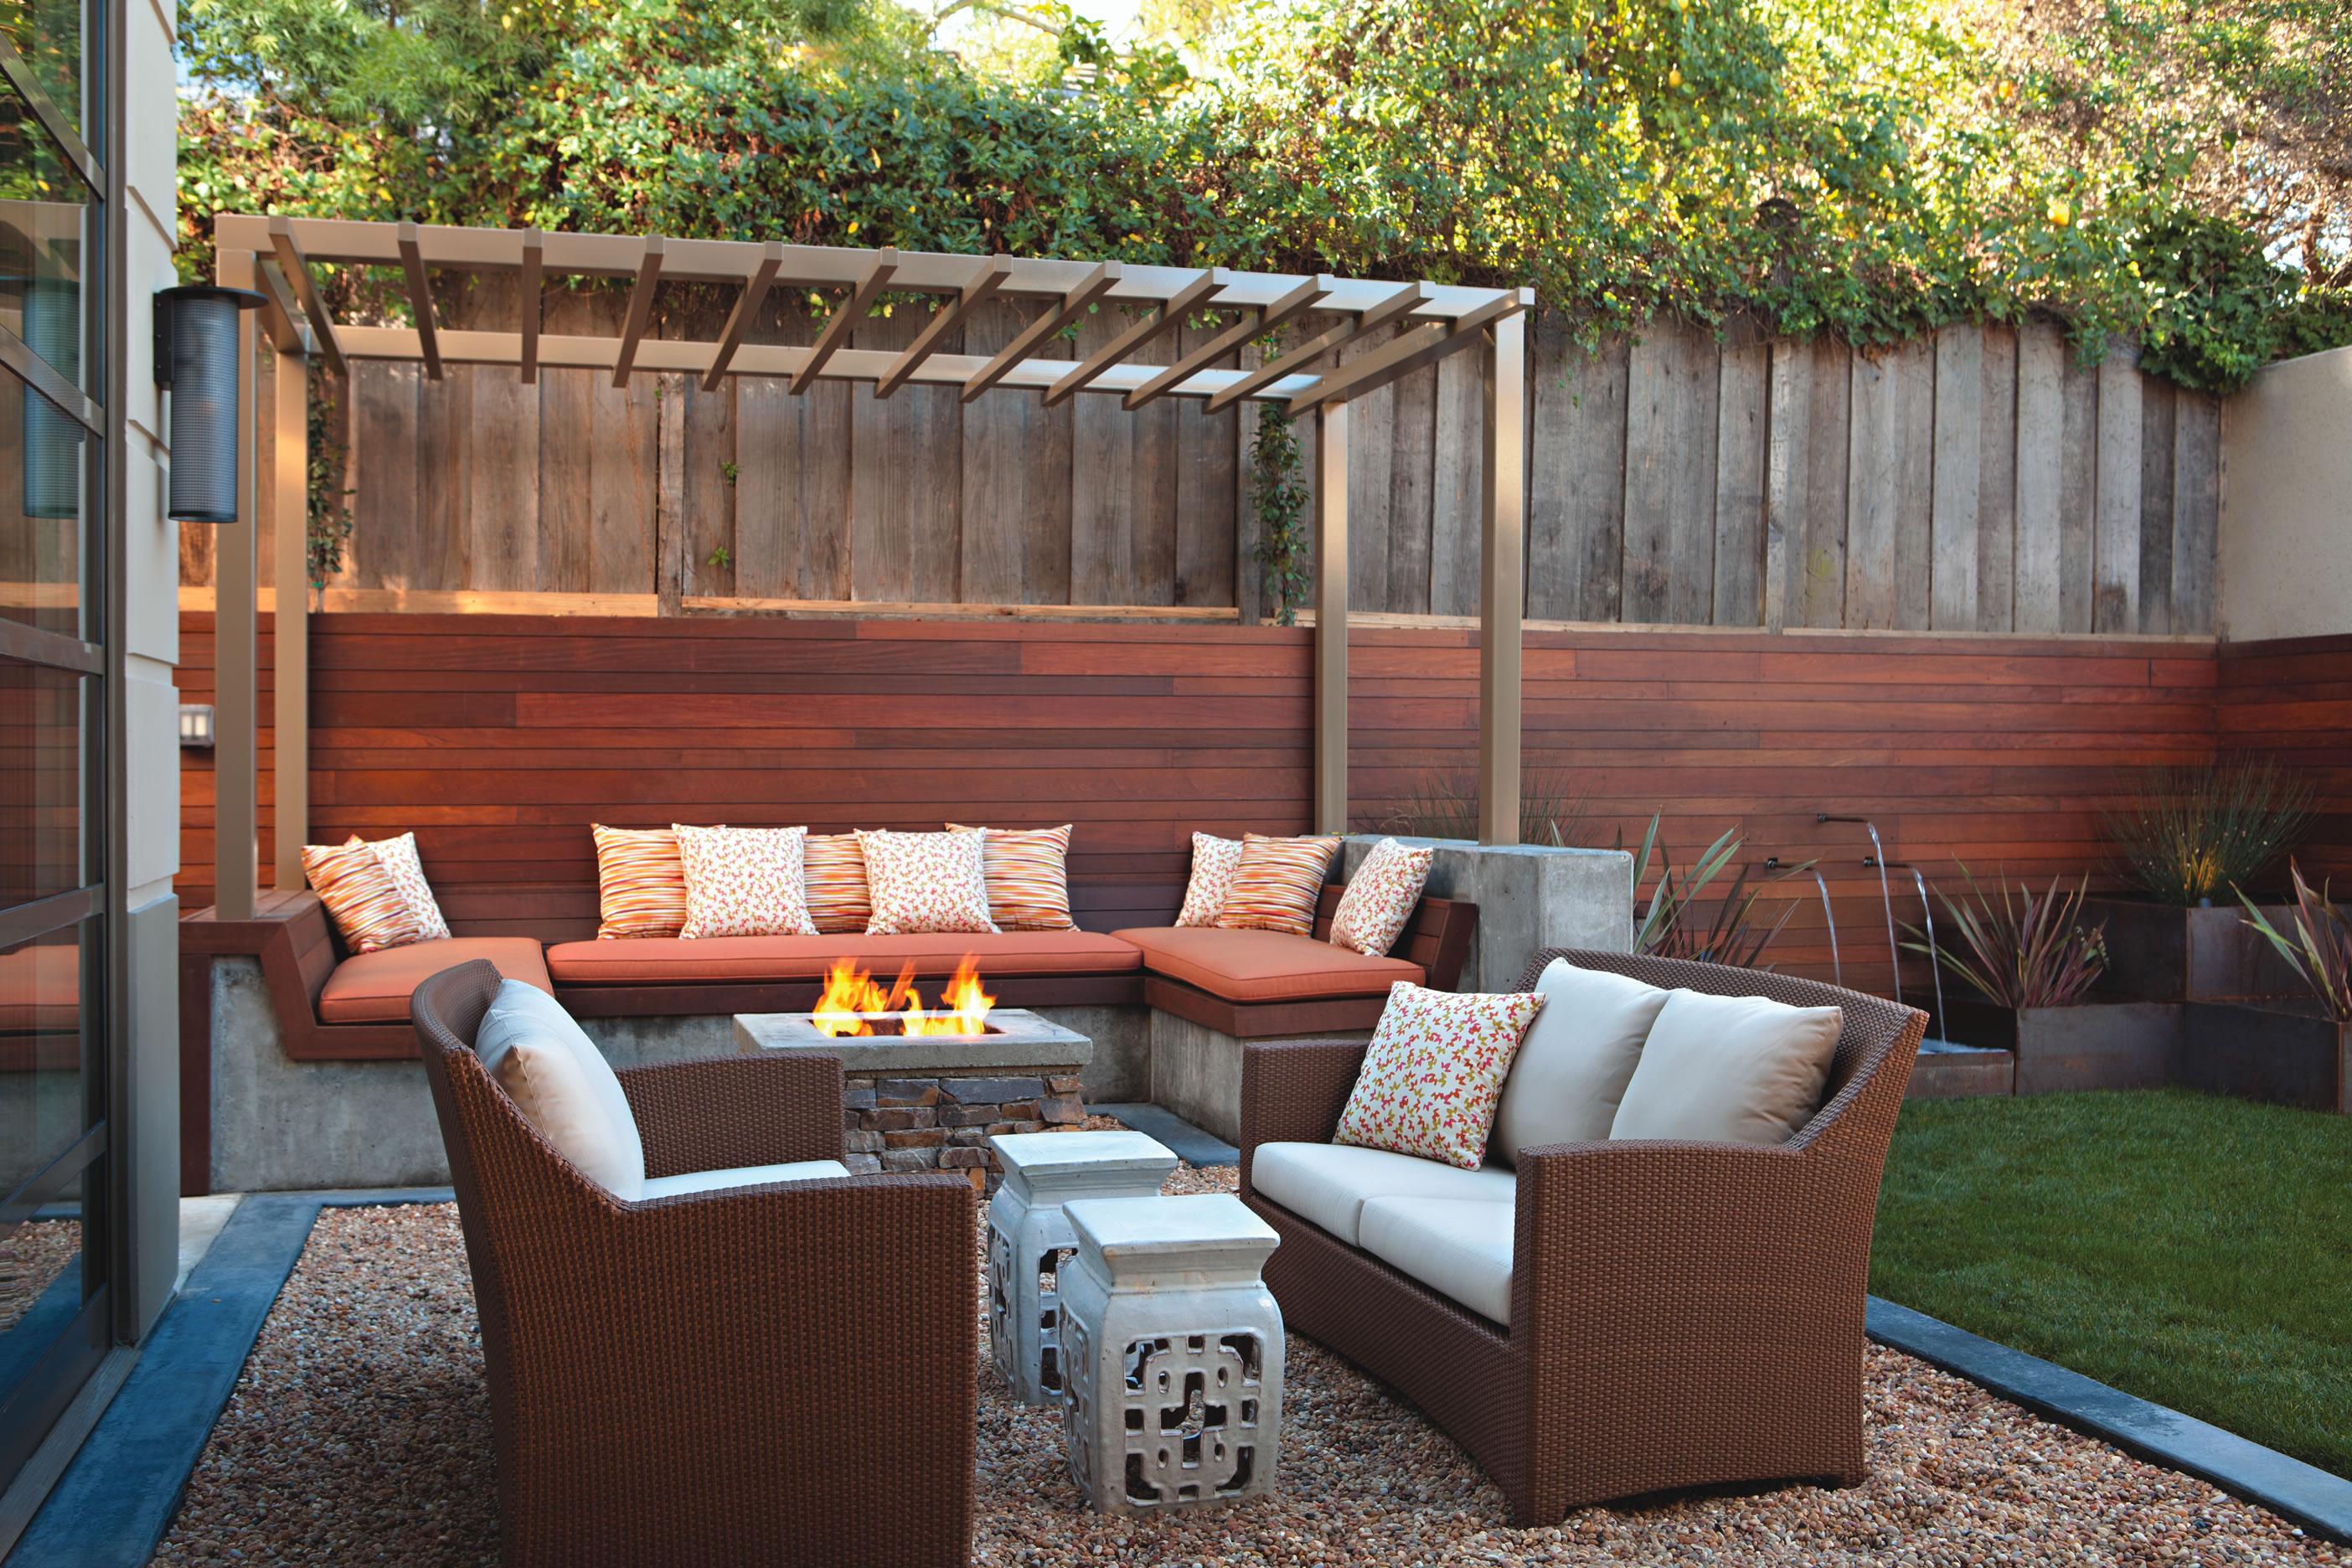 Outdoor Escapes - Laguna Beach Magazine | Firebrand Media LLC on Back Garden Seating Area Ideas id=82240